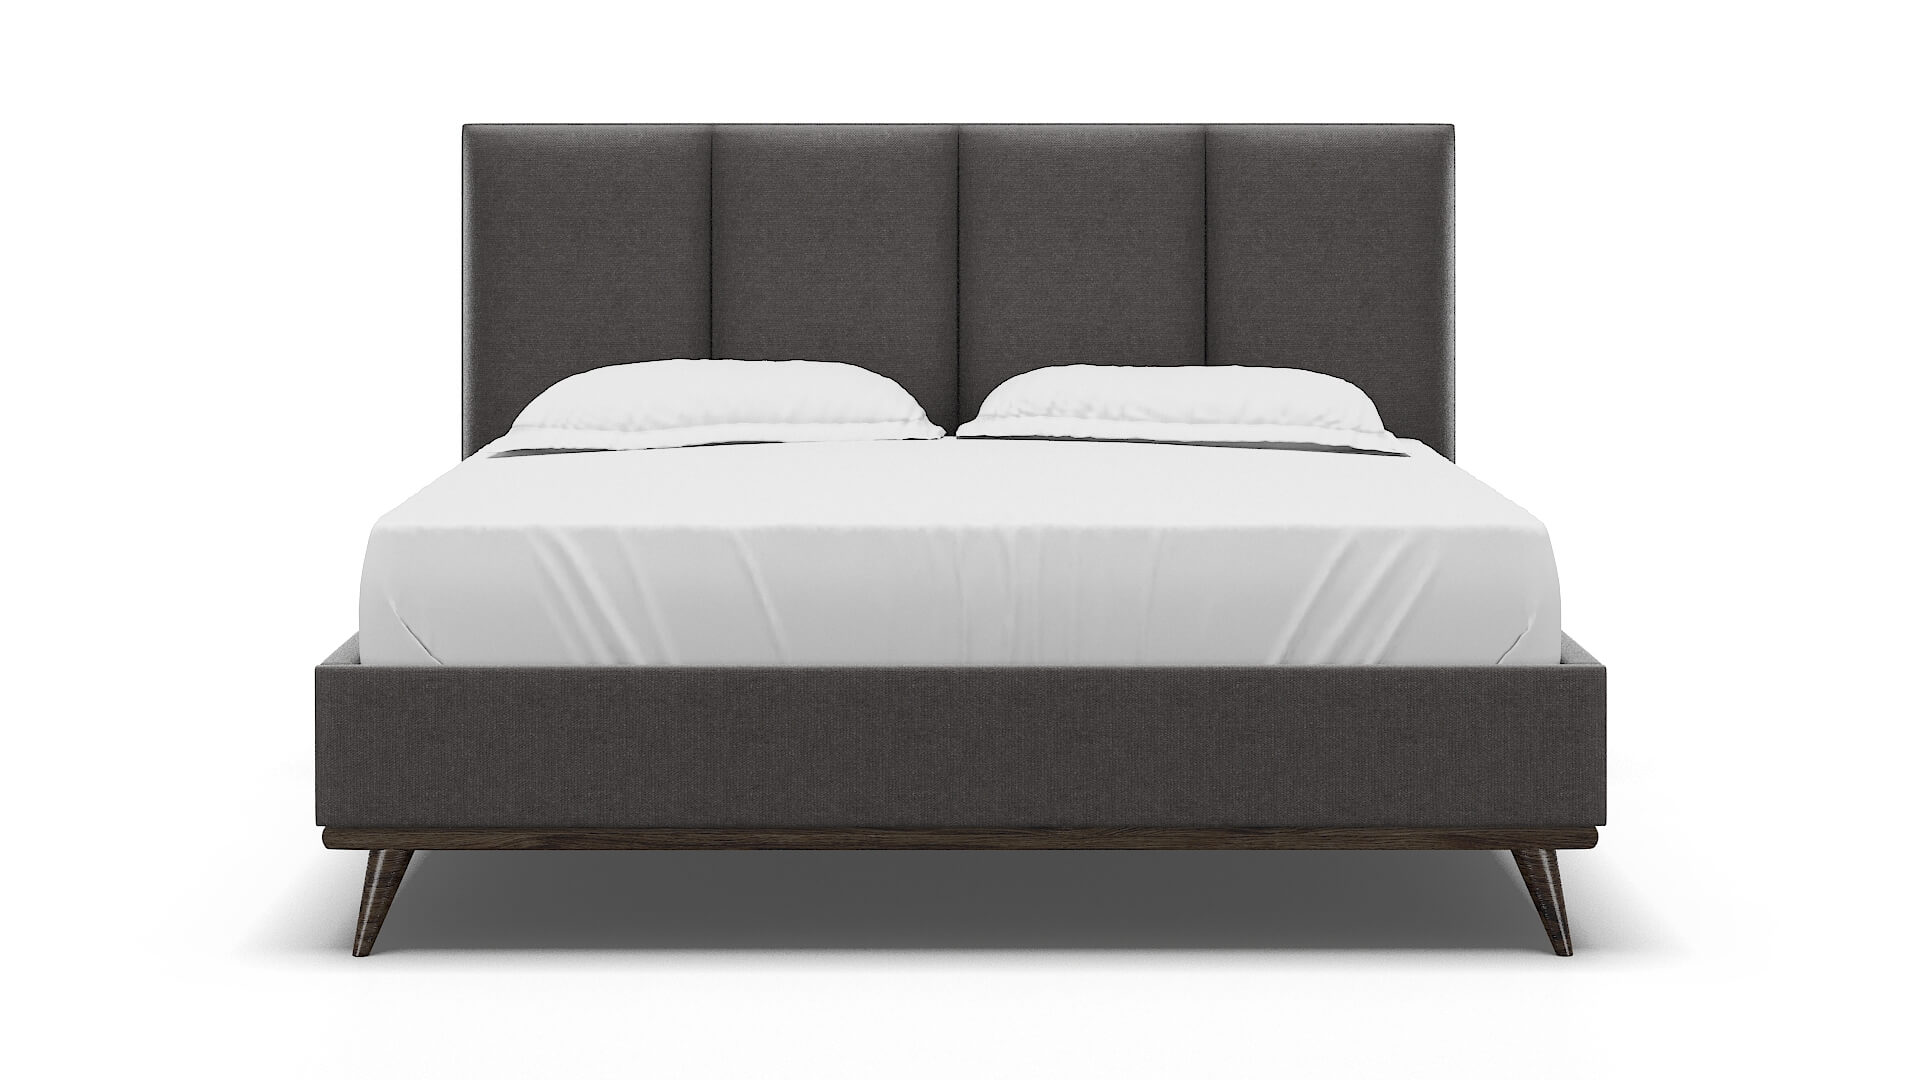 Celine Sasha Grey Bed King espresso legs 1